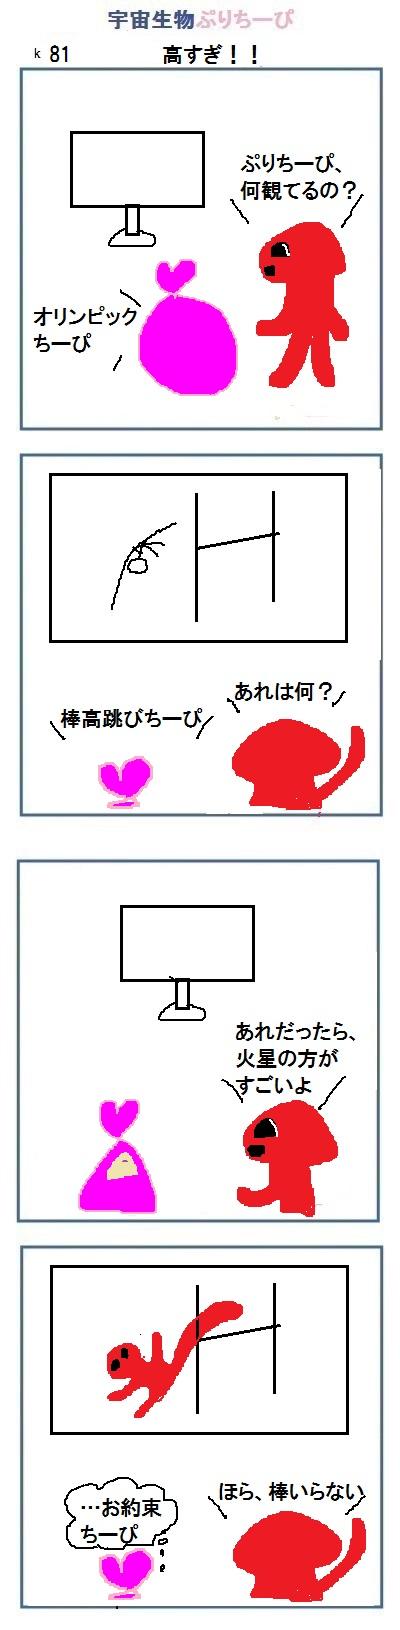 160825_k81.jpg